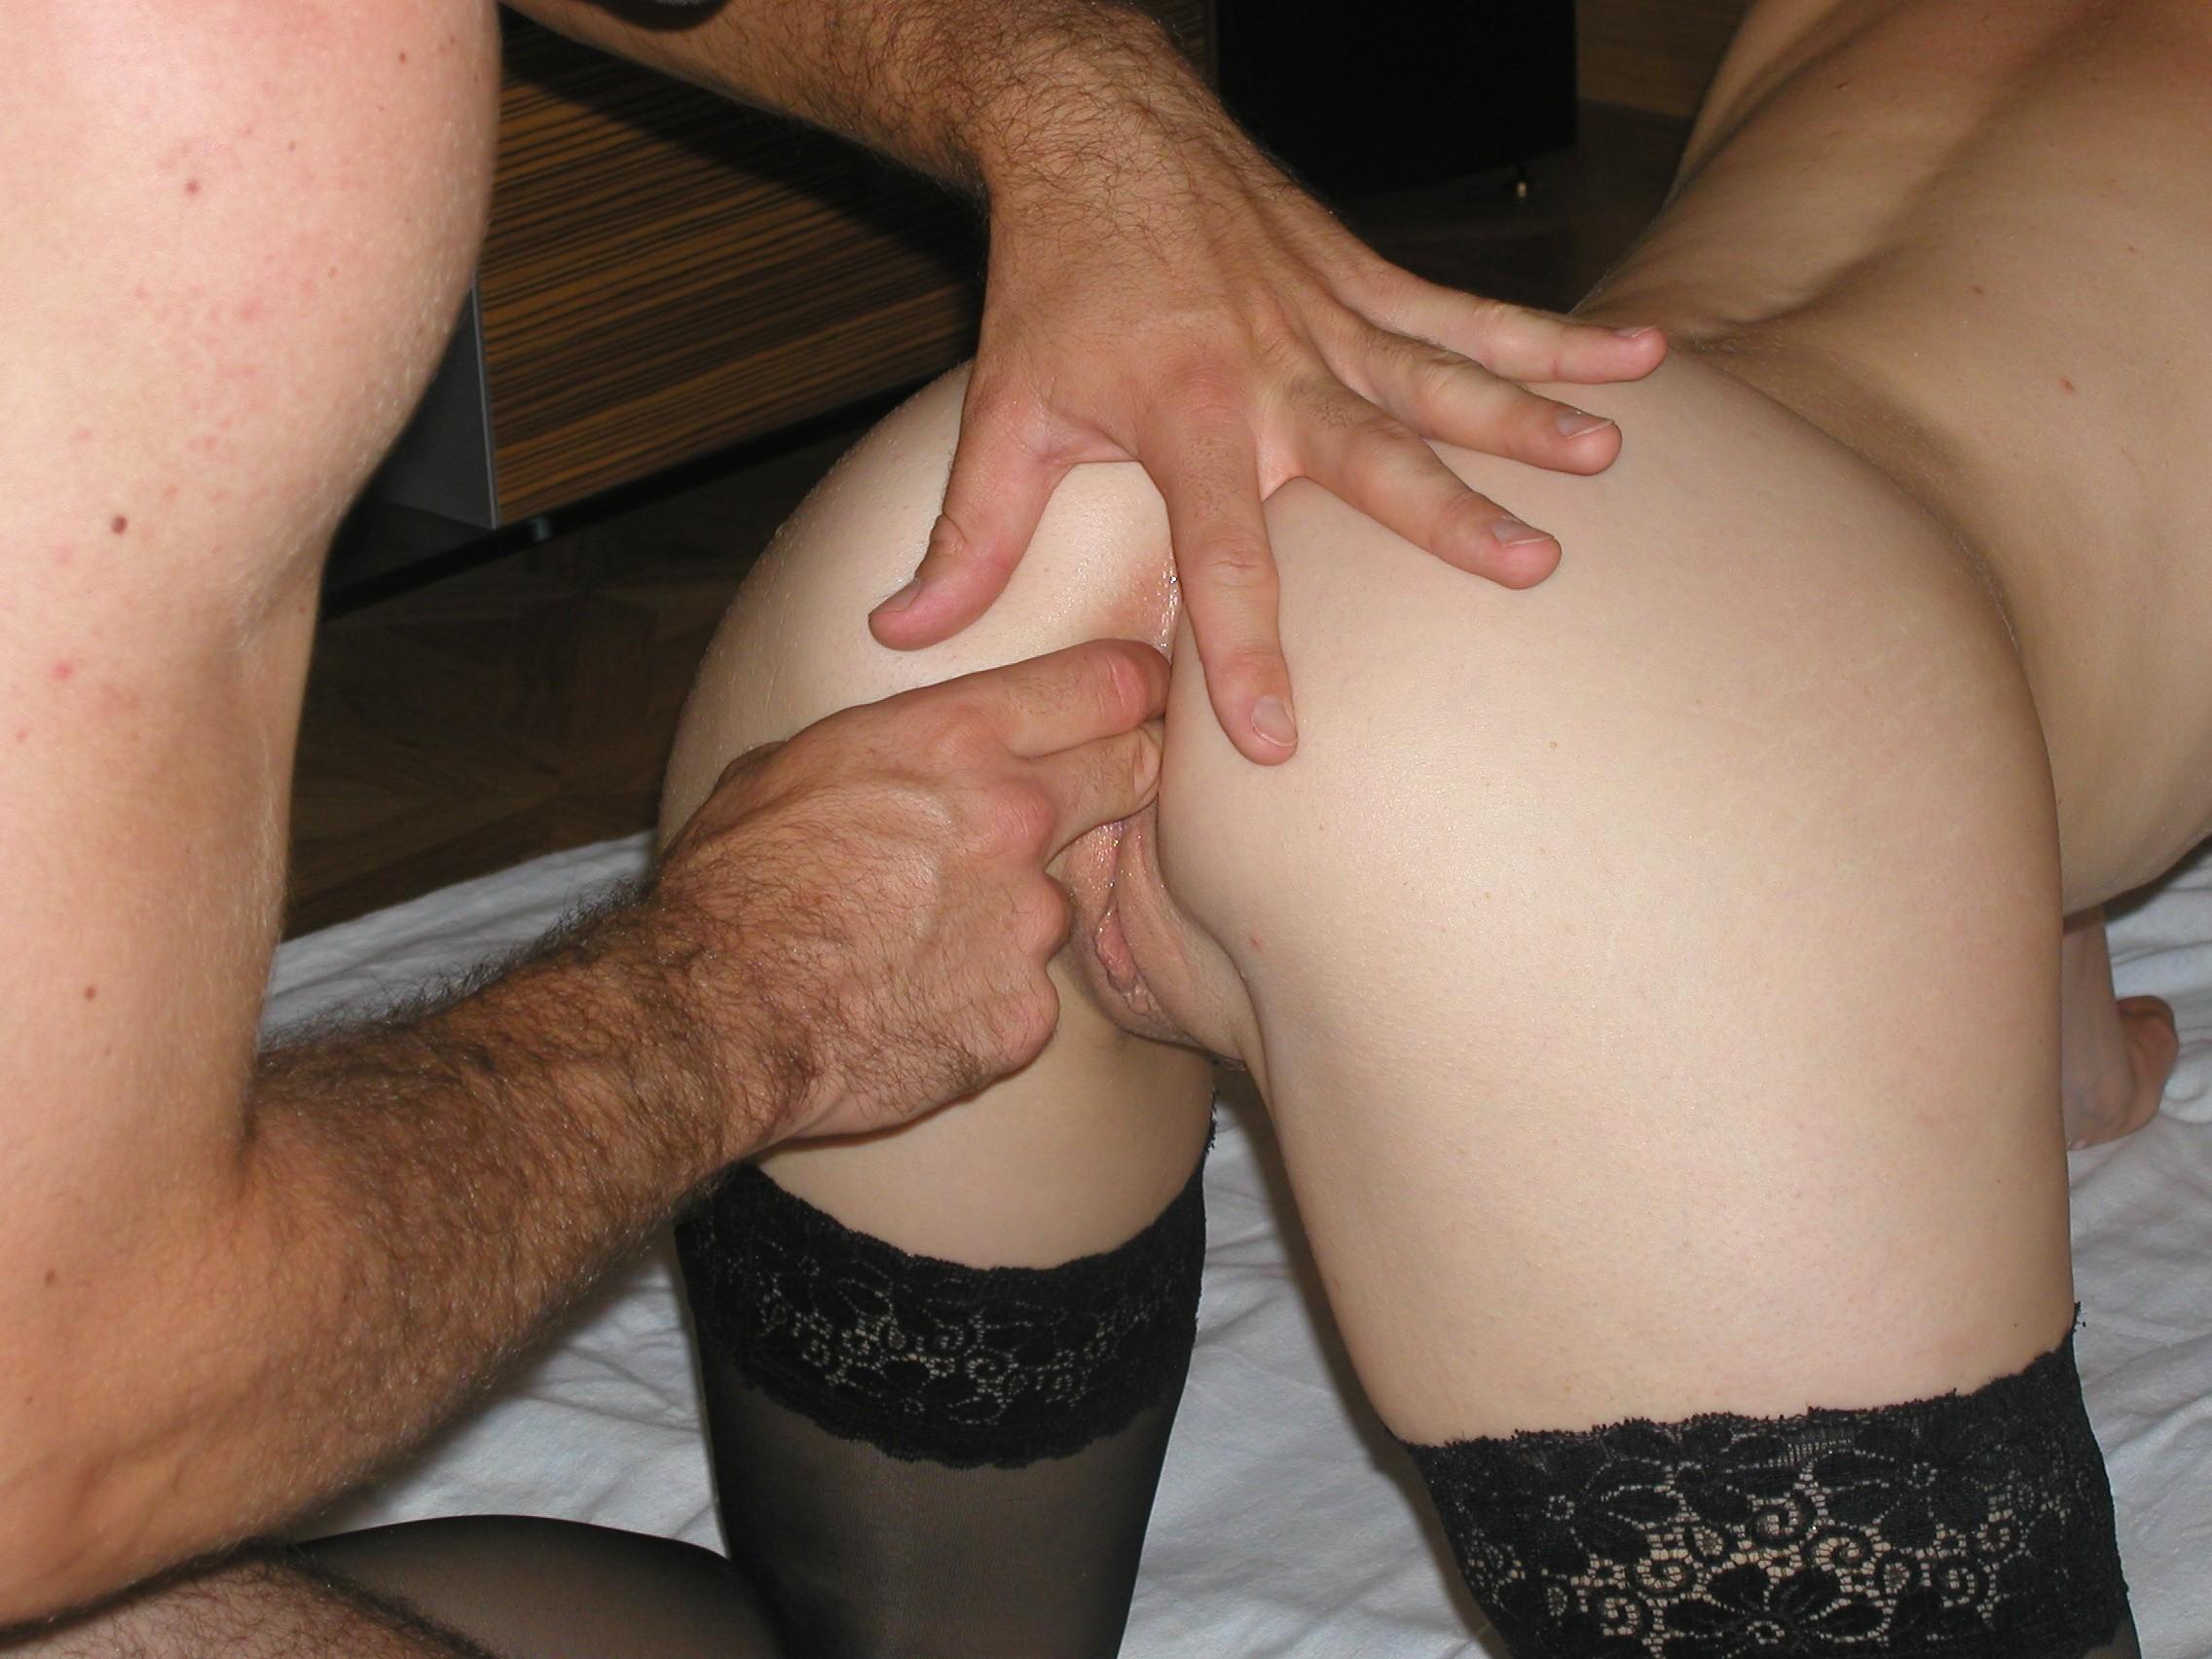 Жена раком с хуем вжопе фото, порно эротика звезды